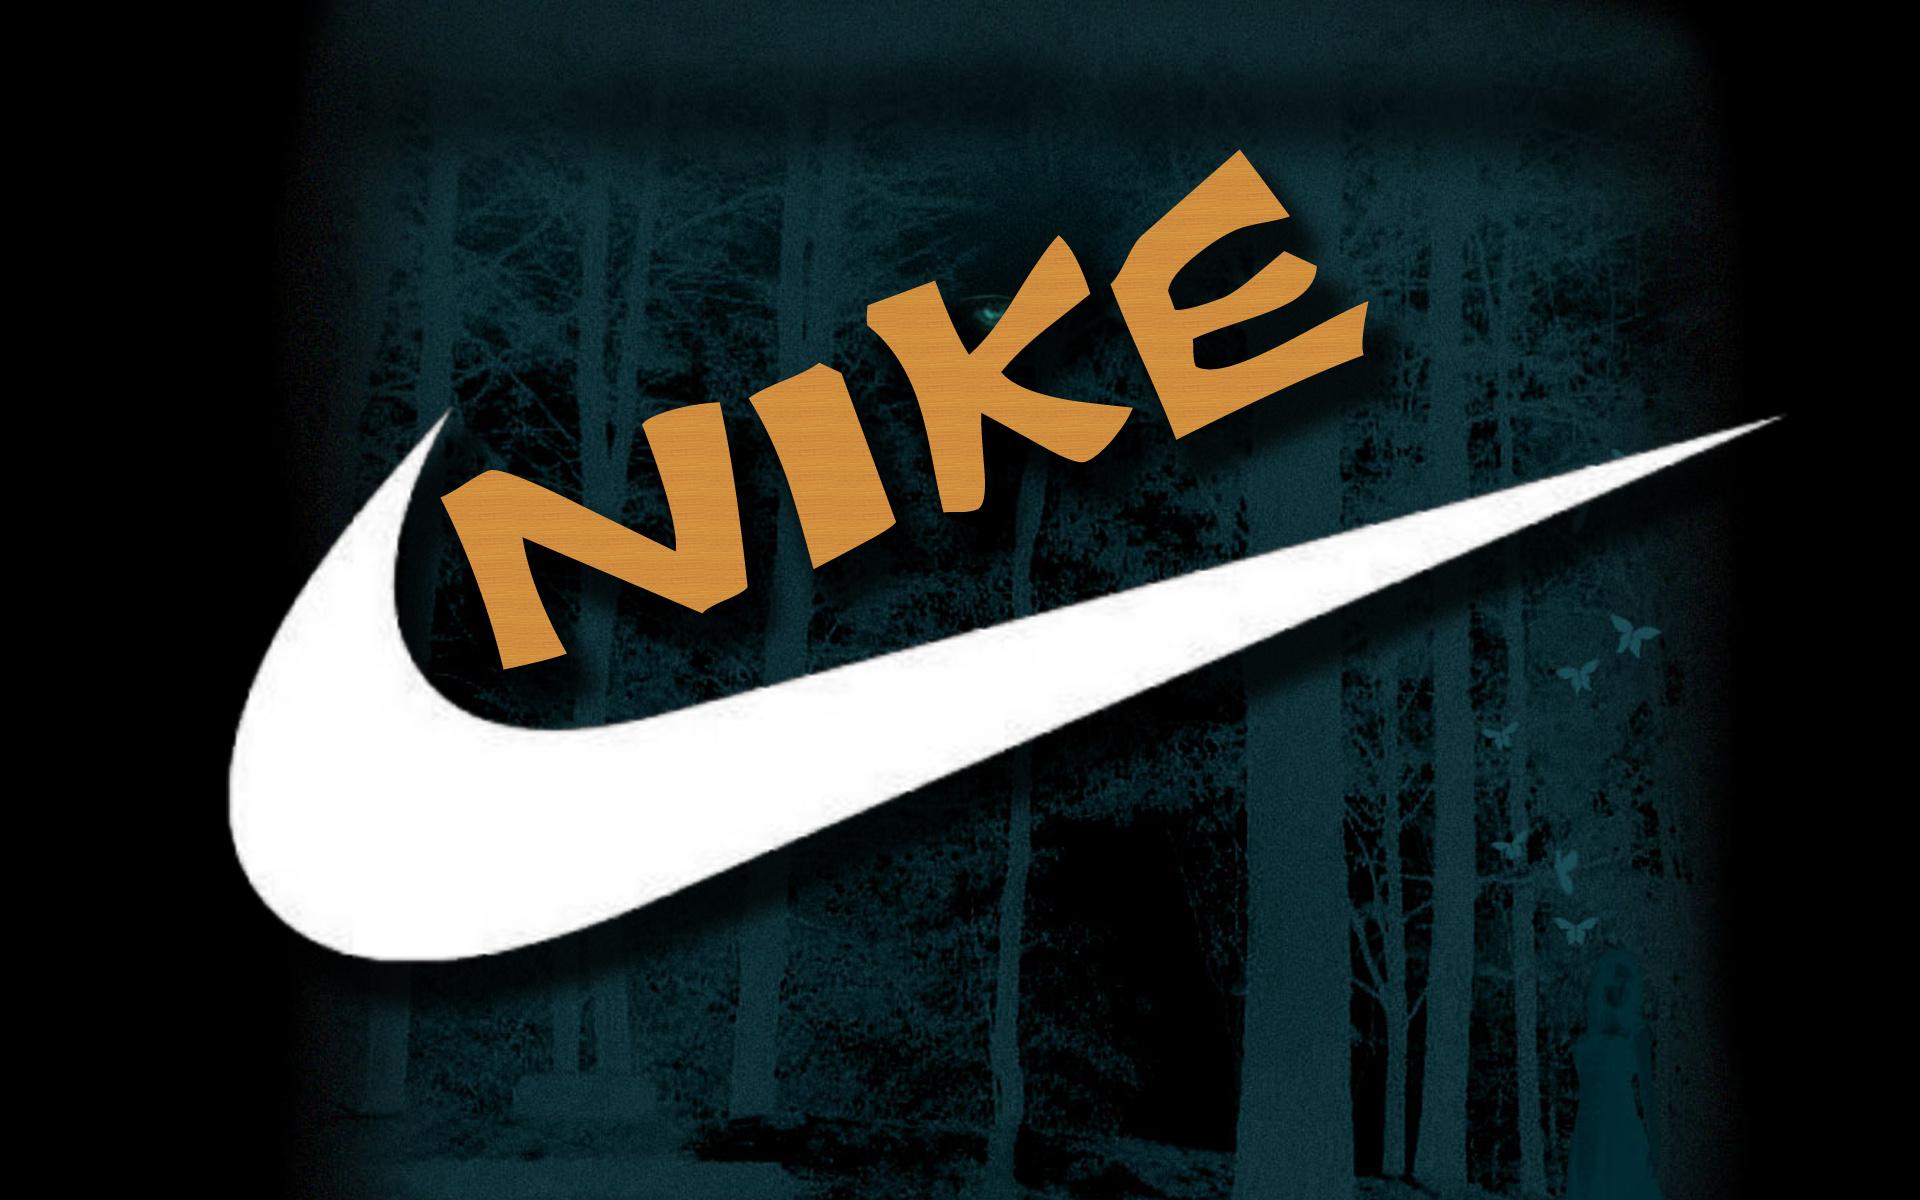 Nike Logo Cool Hd Wallpaper Download wallpapers page 1920x1200